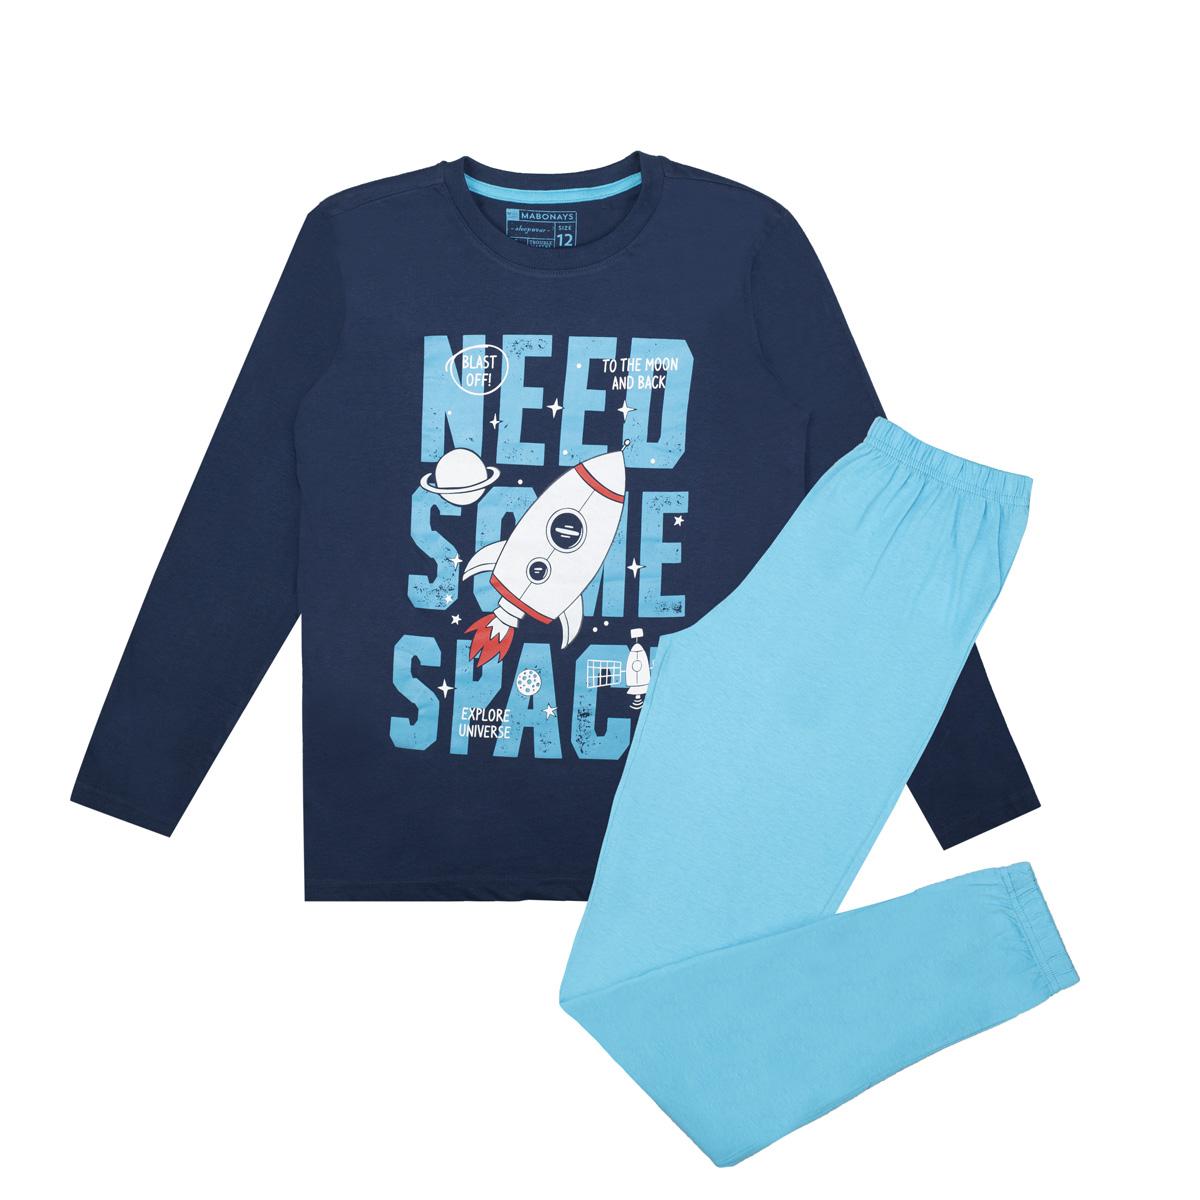 Fantovska pižama, temno modra